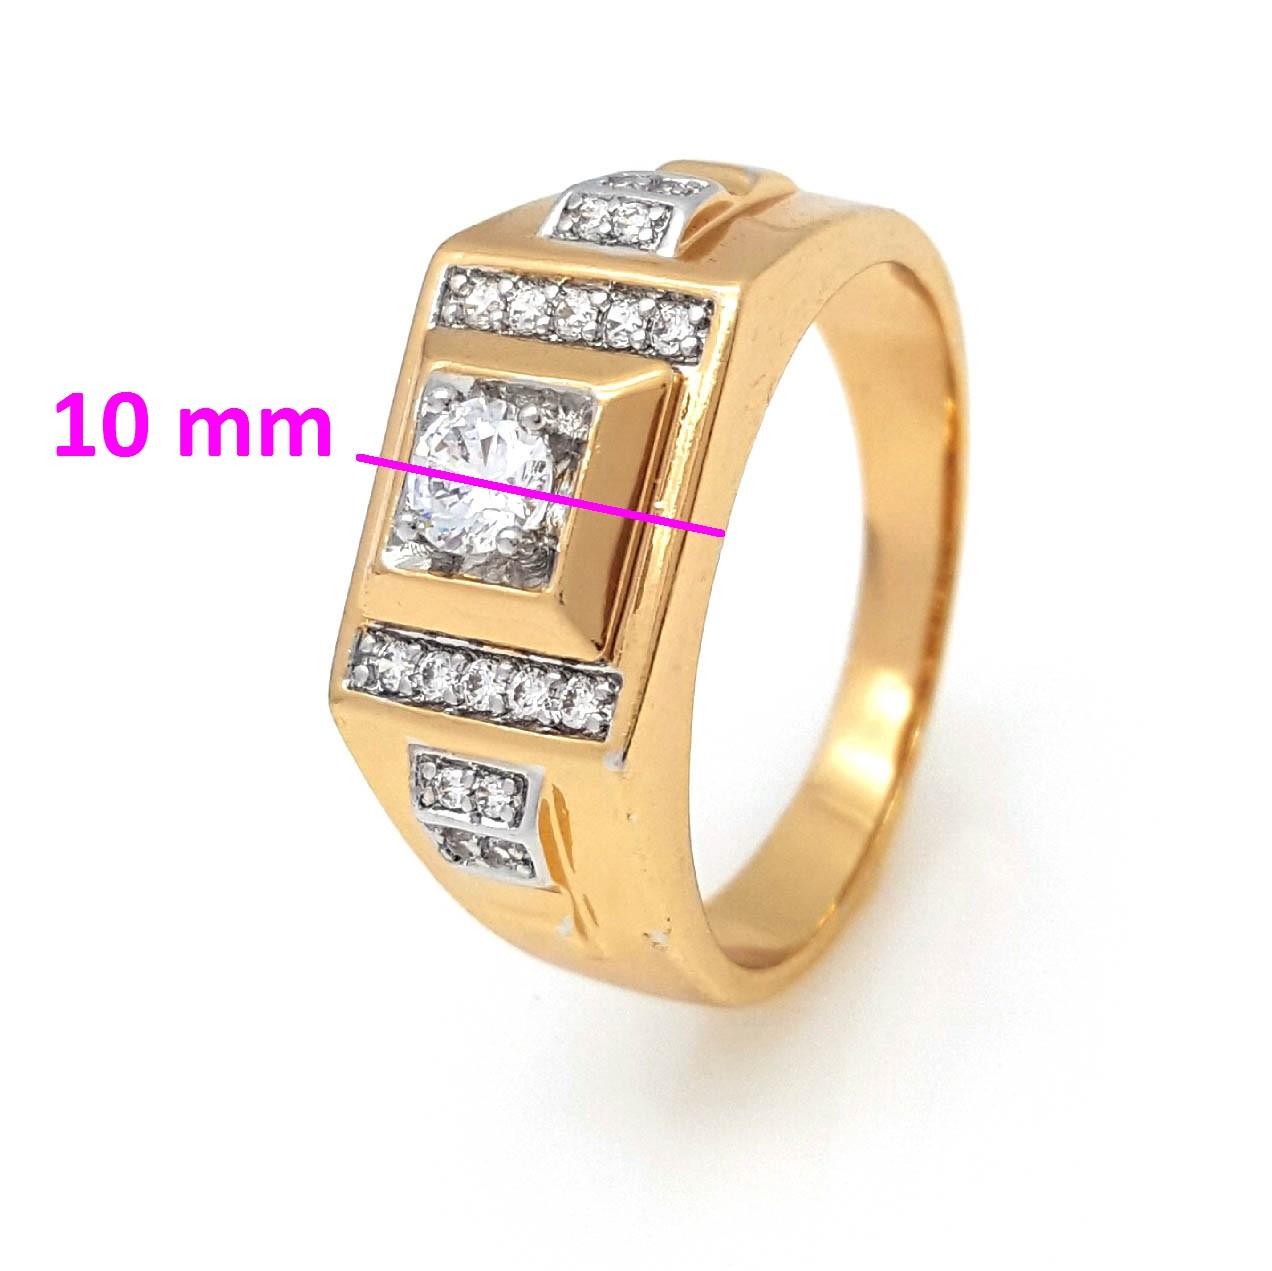 Кольцо Печатка в камнях, р.19,5 ,р.20, р.20,5 позолота+родий